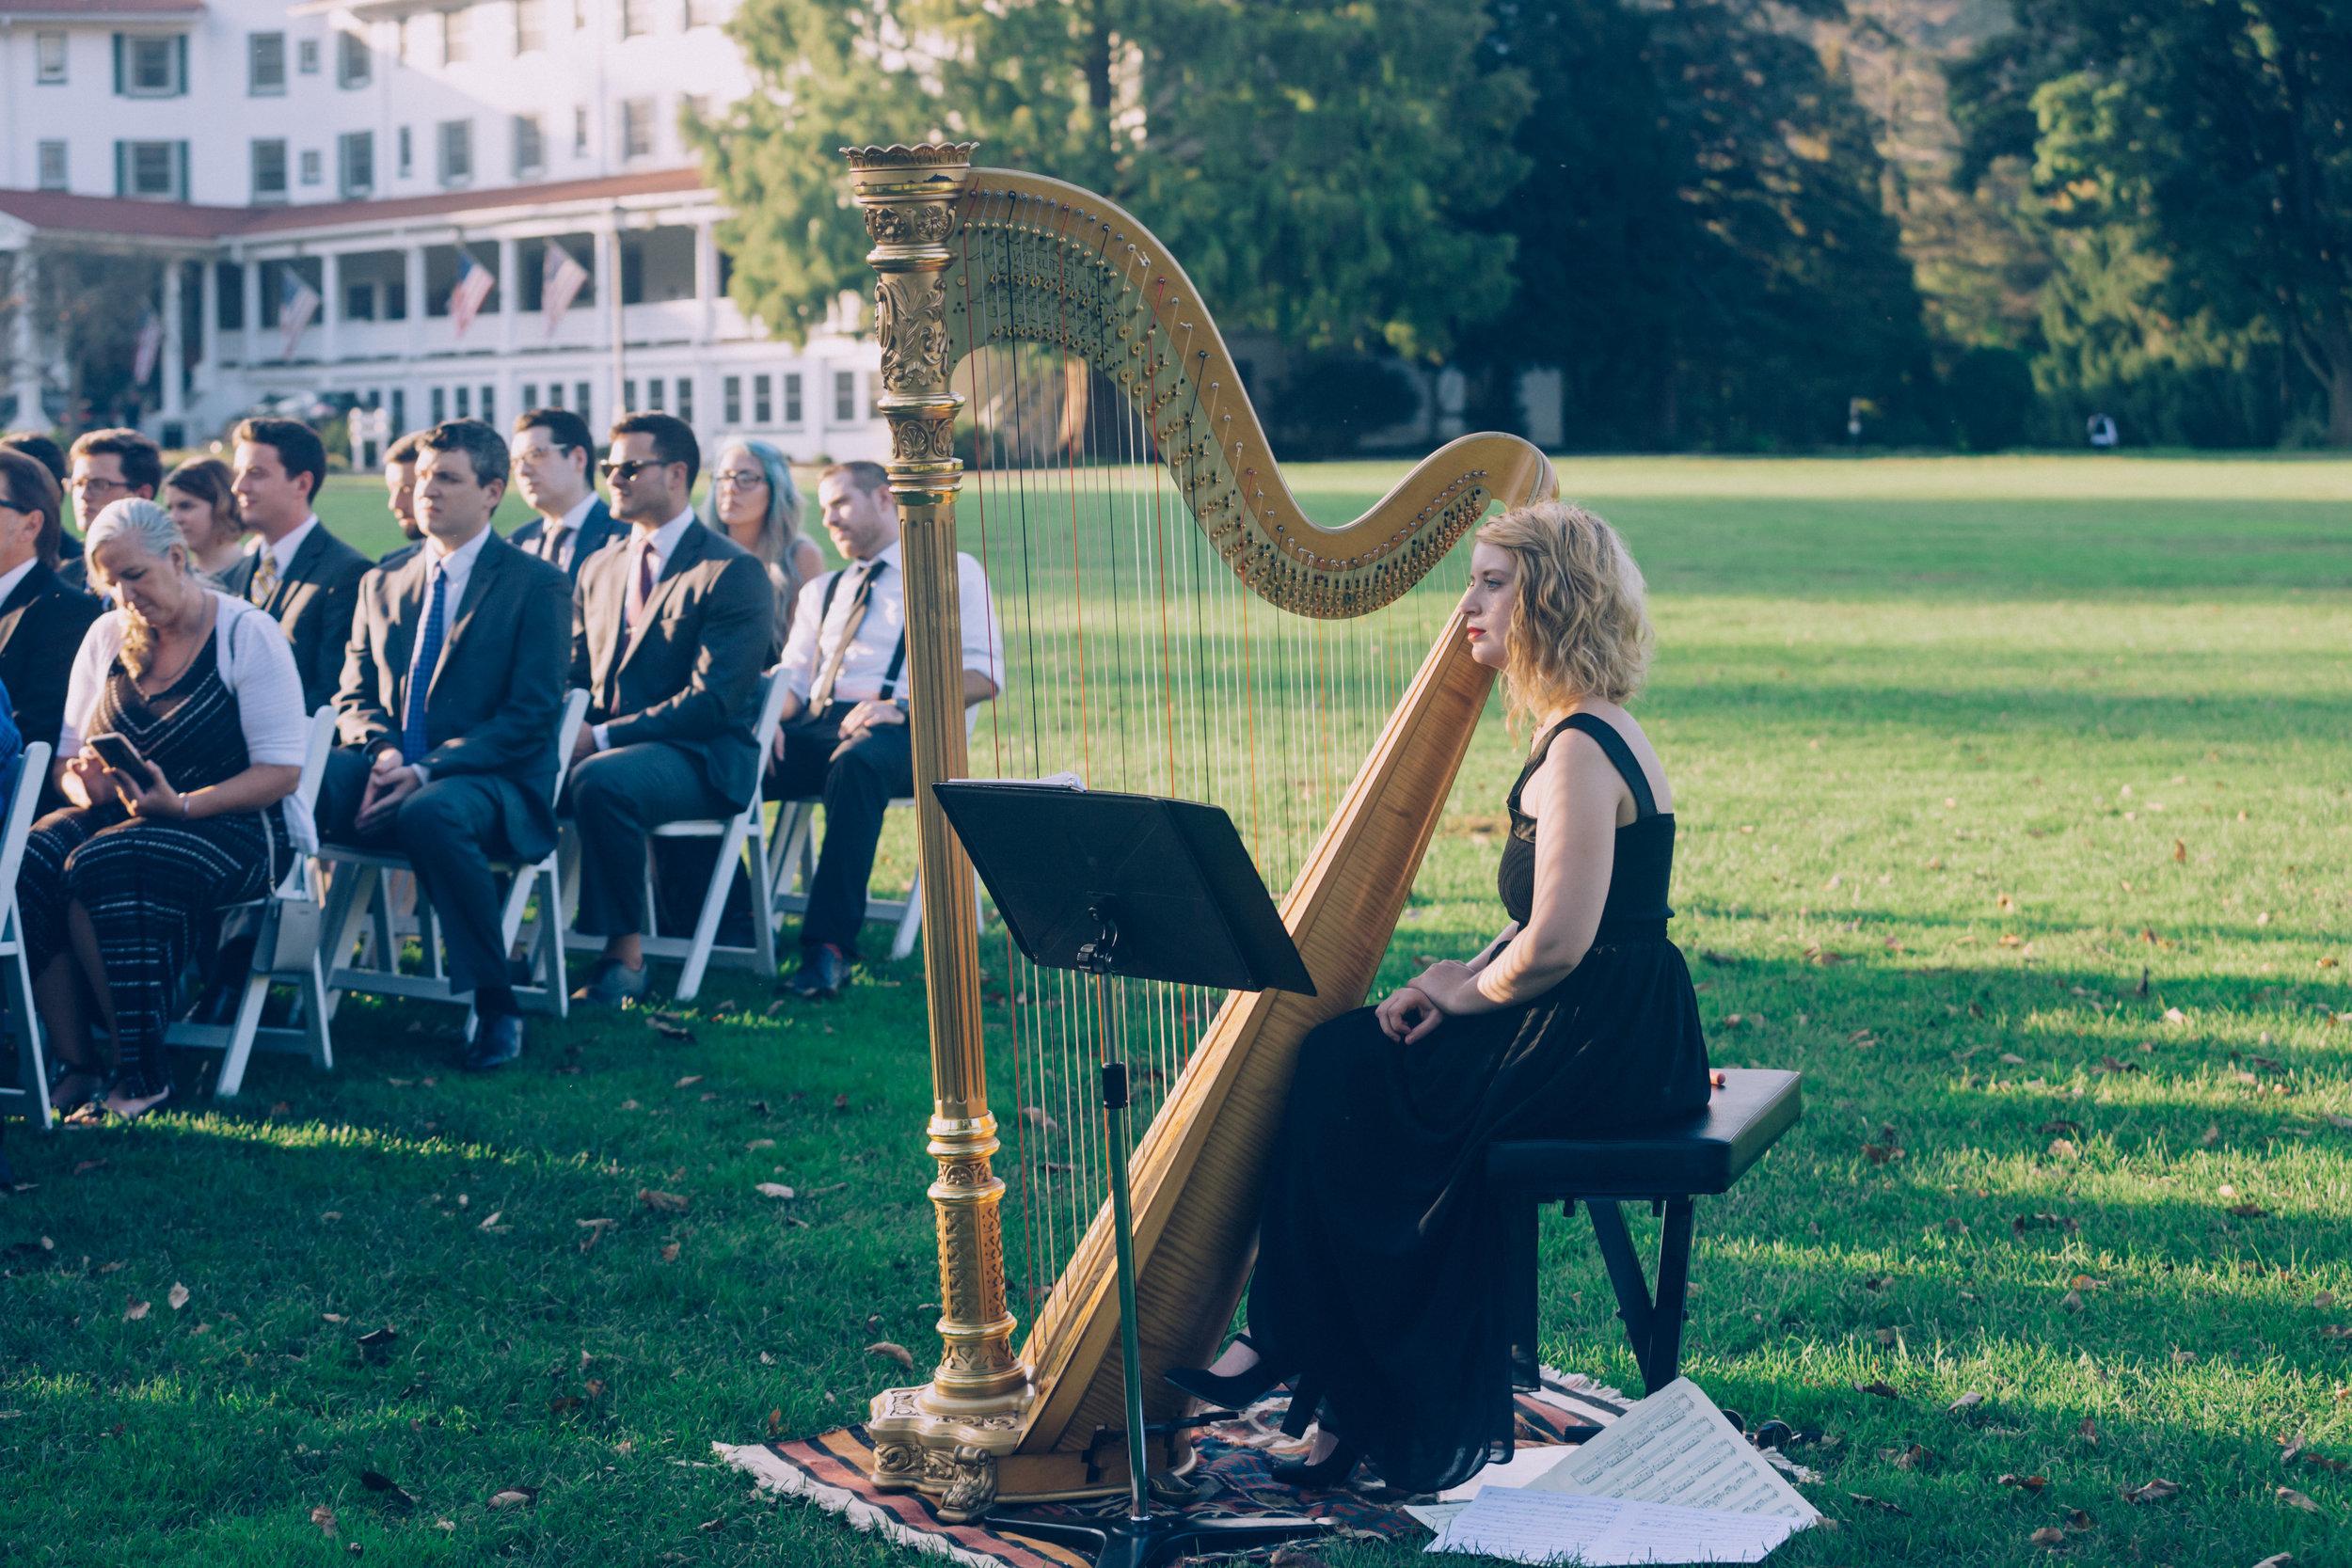 Wedding of Heather and Wouter photo by Lisa DeNardo Photography @lisadenardo